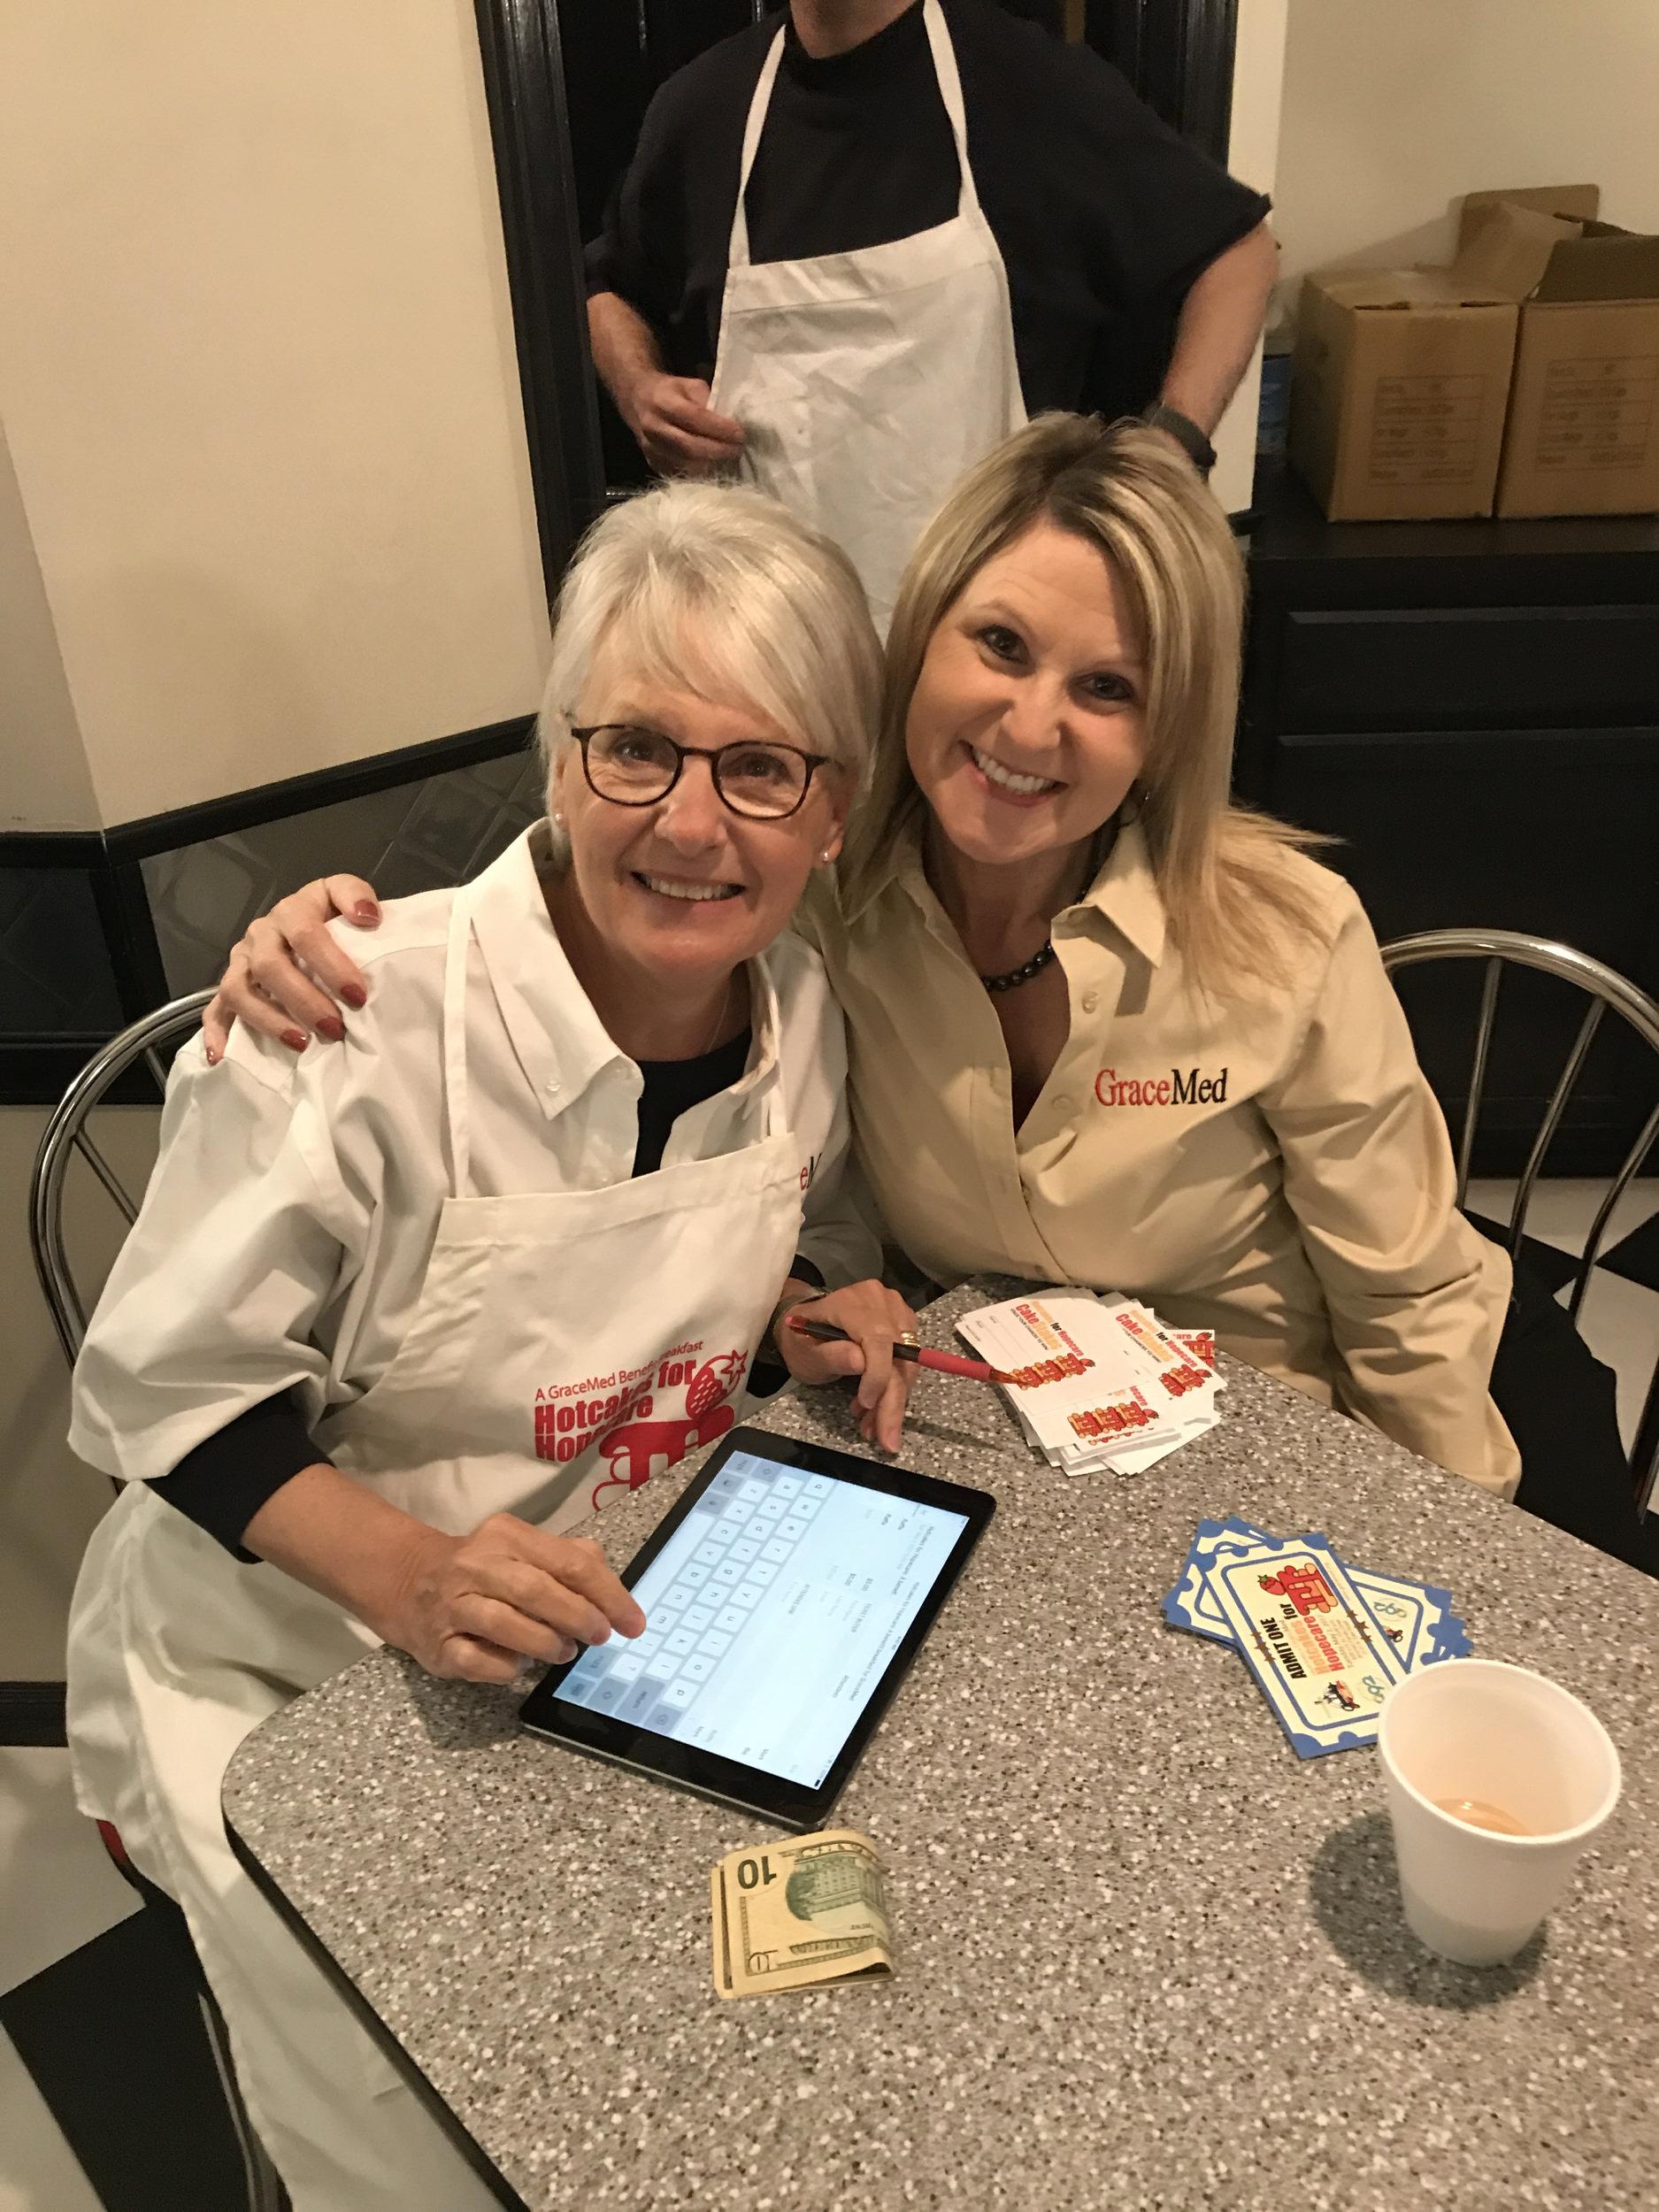 Debbie Sanford & Lesa Dreifort at the first annual Hotcakes for Hopecare